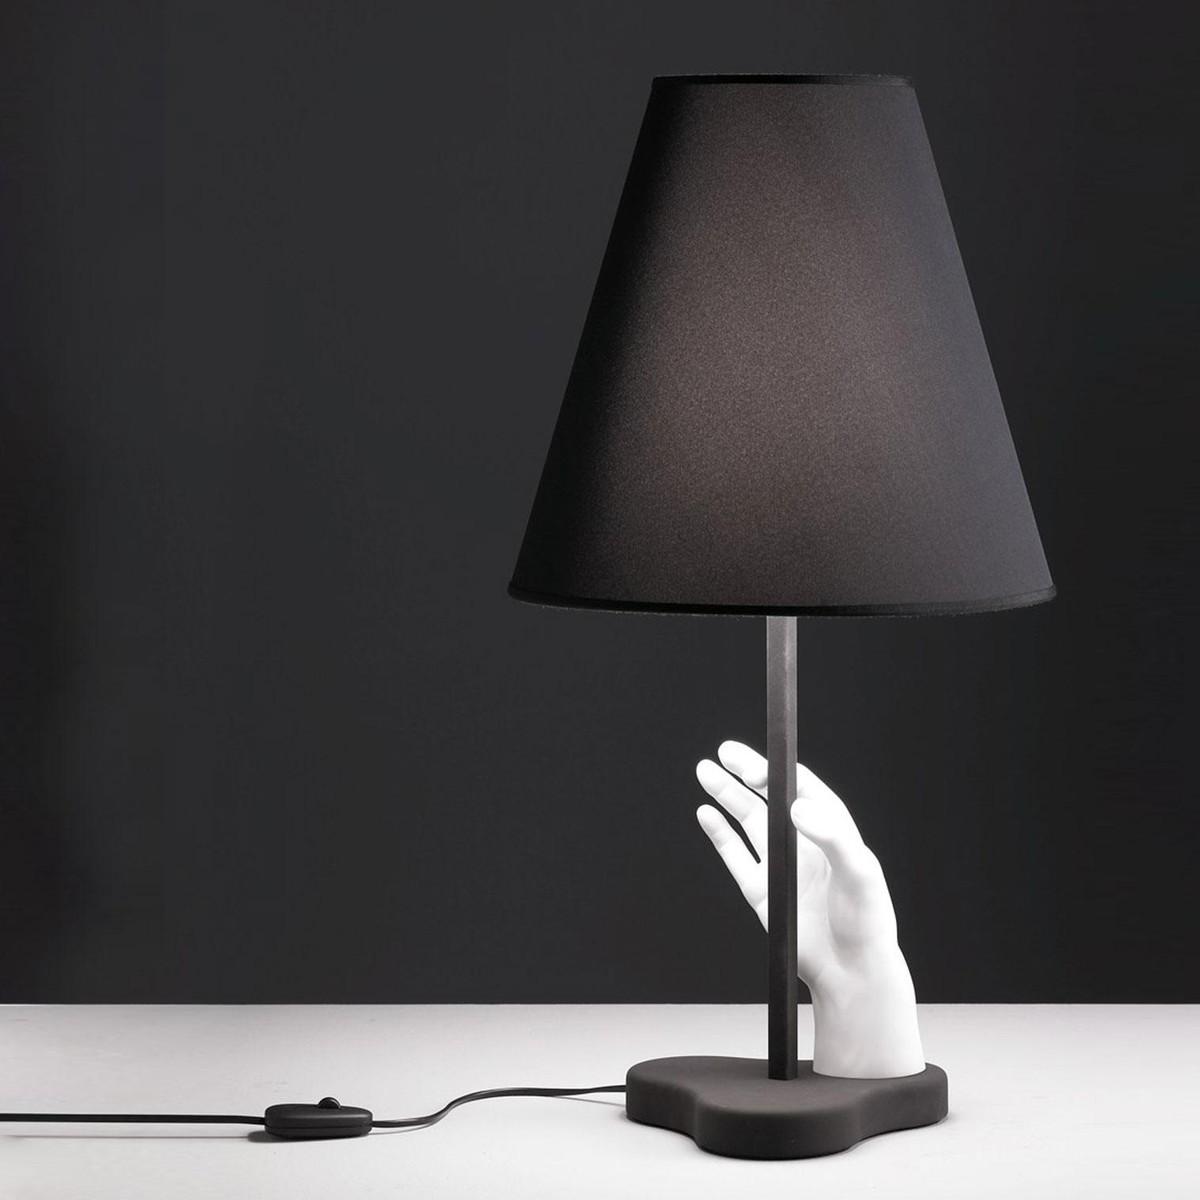 mano lampe du table fontana arte. Black Bedroom Furniture Sets. Home Design Ideas